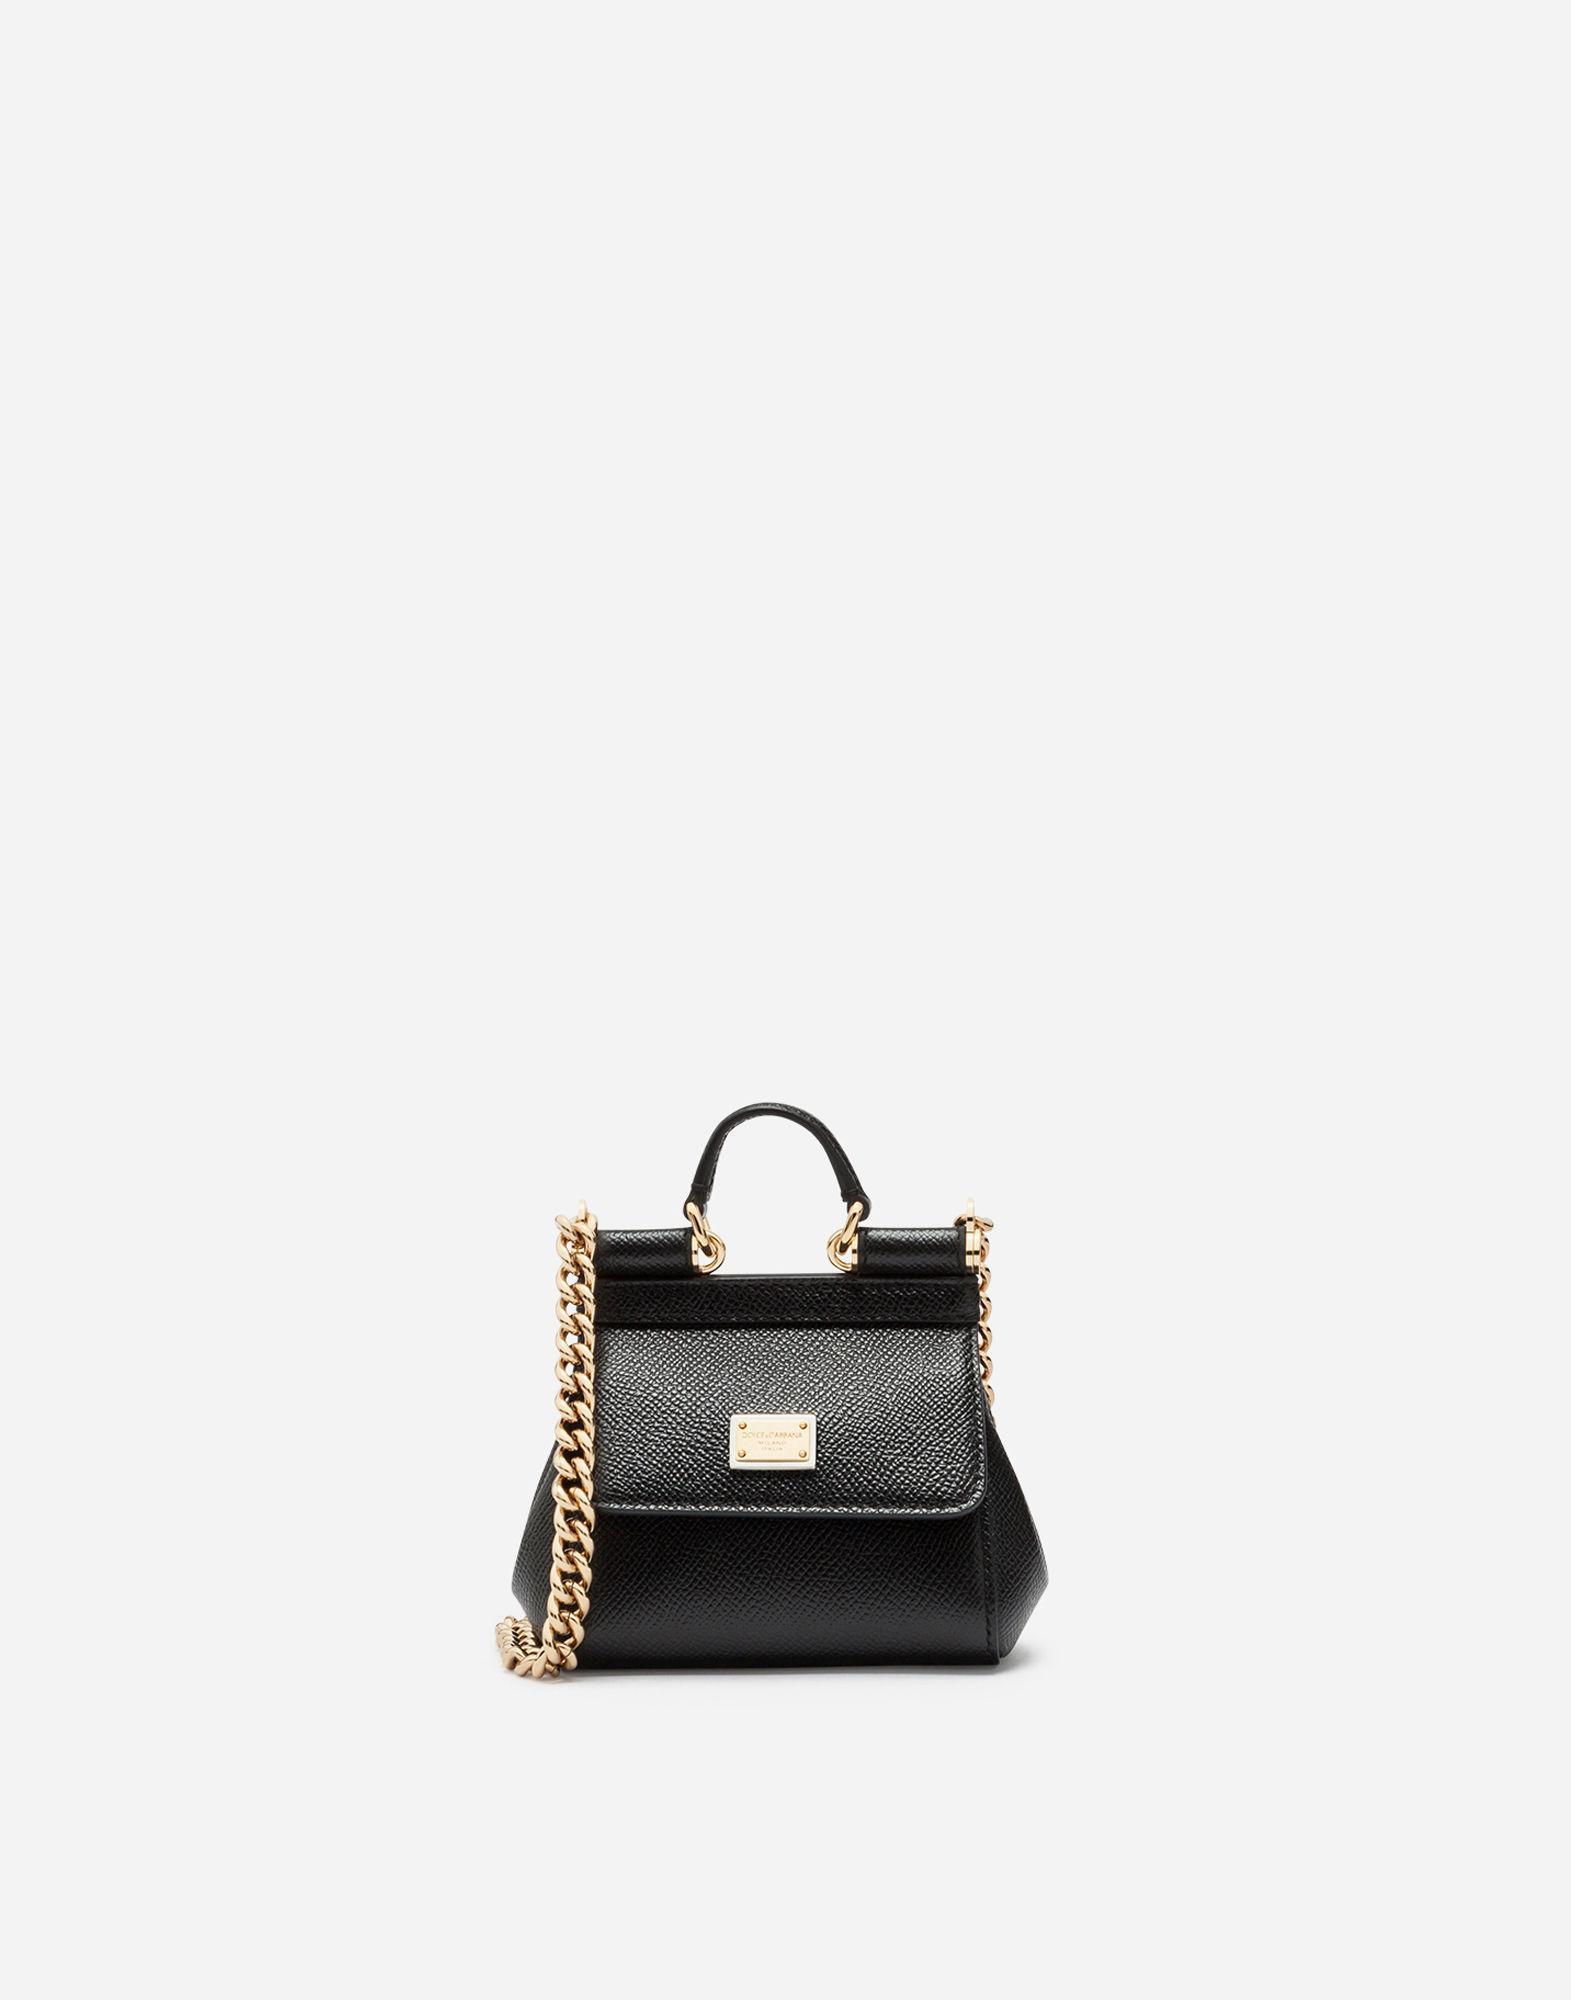 Dolce   Gabbana. Women s Black Sicily Handbag In Printed Dauphine Calfskin 75f291bdda